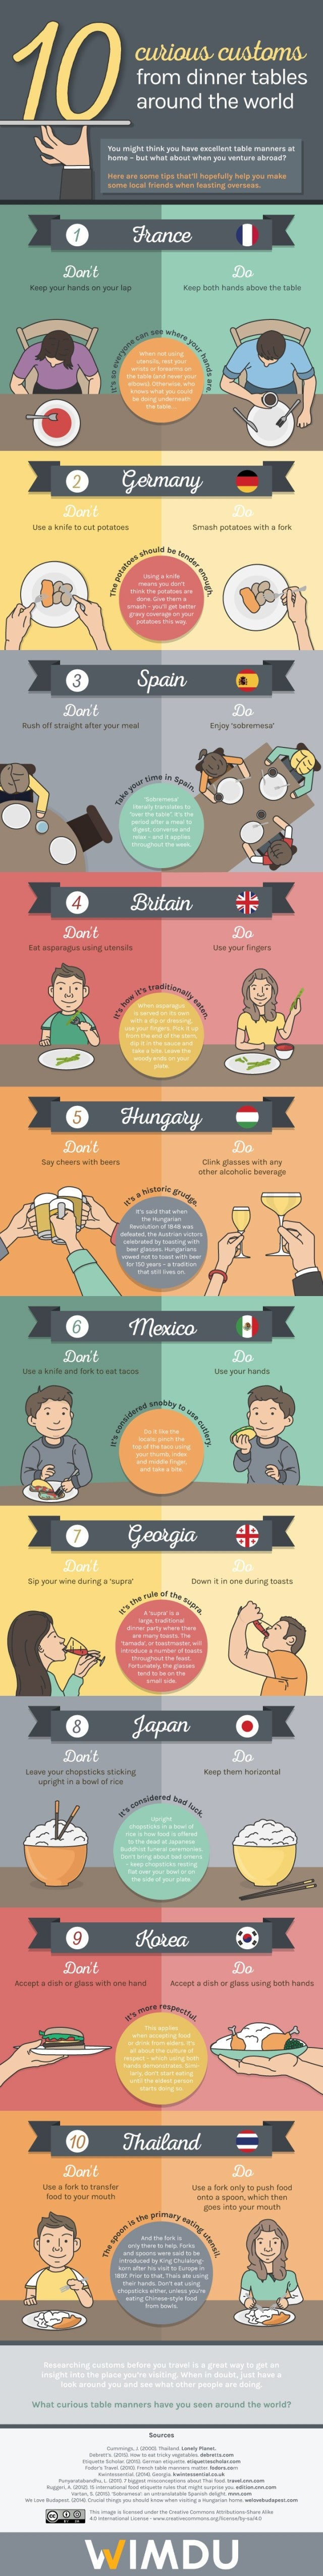 dinner-table-customs-infographic (1)